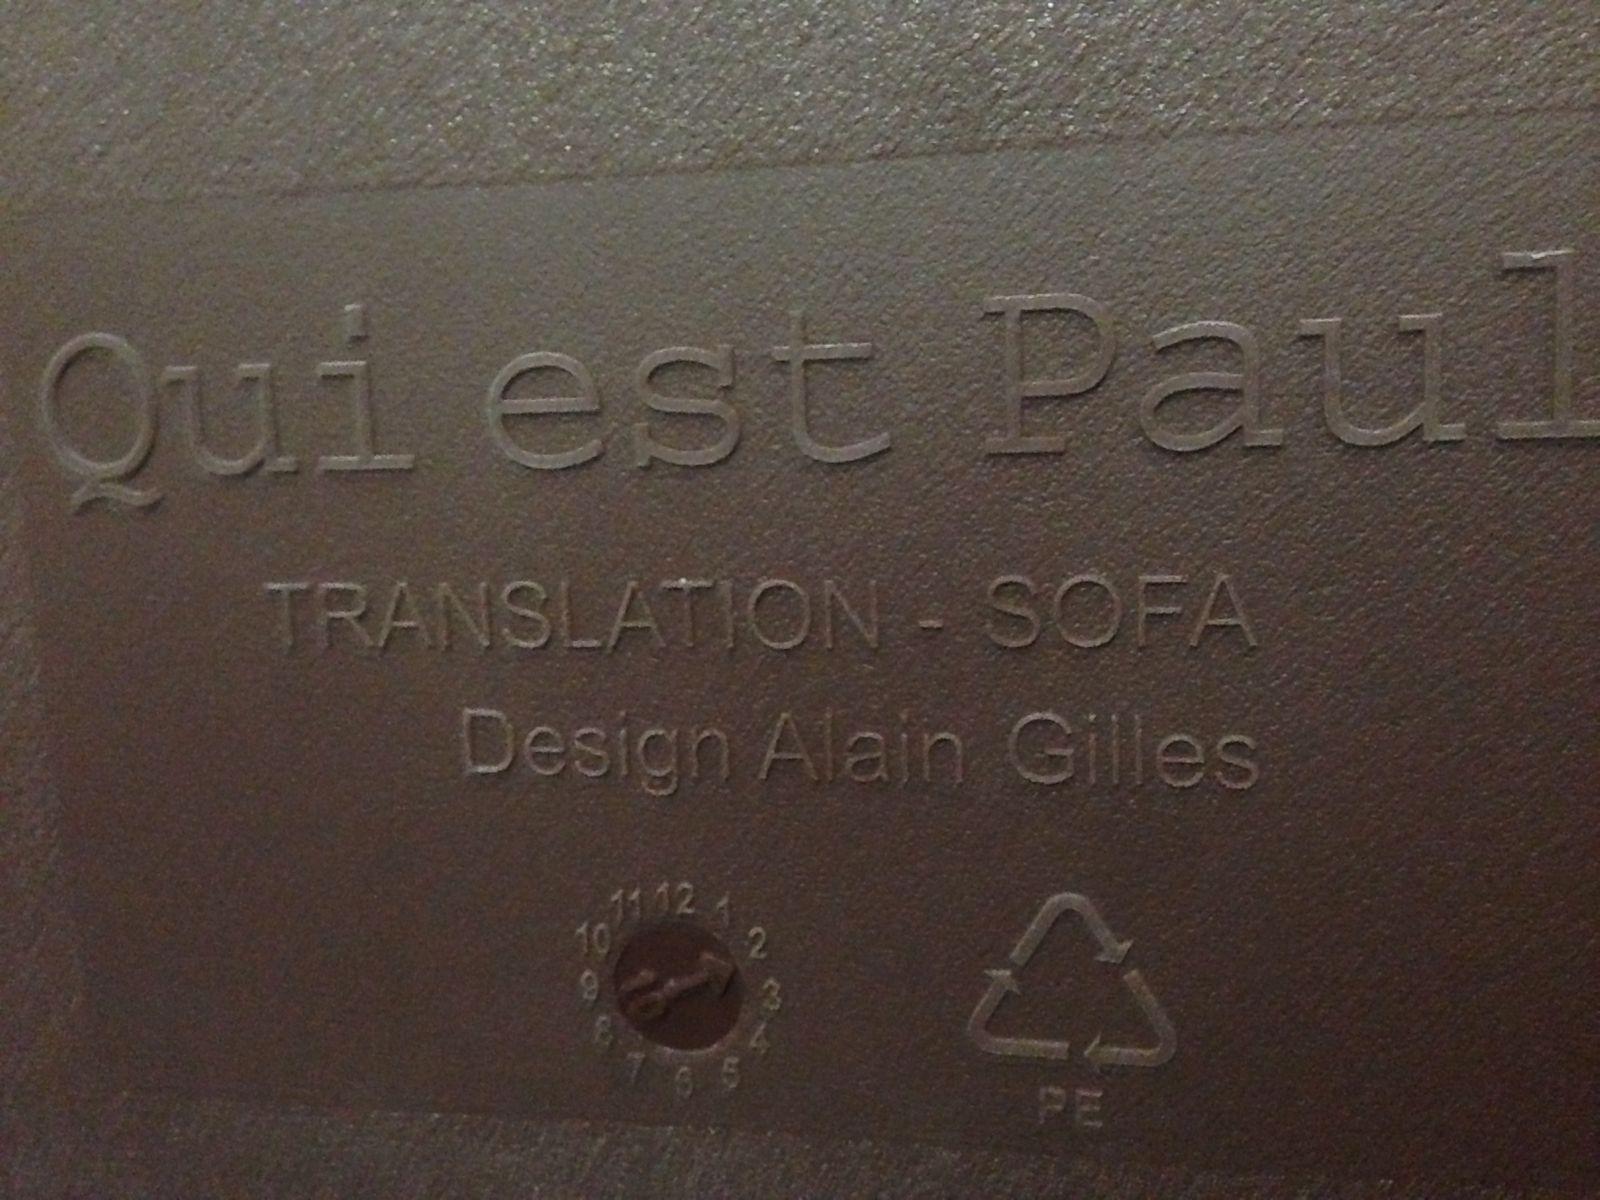 model translation sofa by alain gilles for qui est paul 2008 for sale at pamono. Black Bedroom Furniture Sets. Home Design Ideas